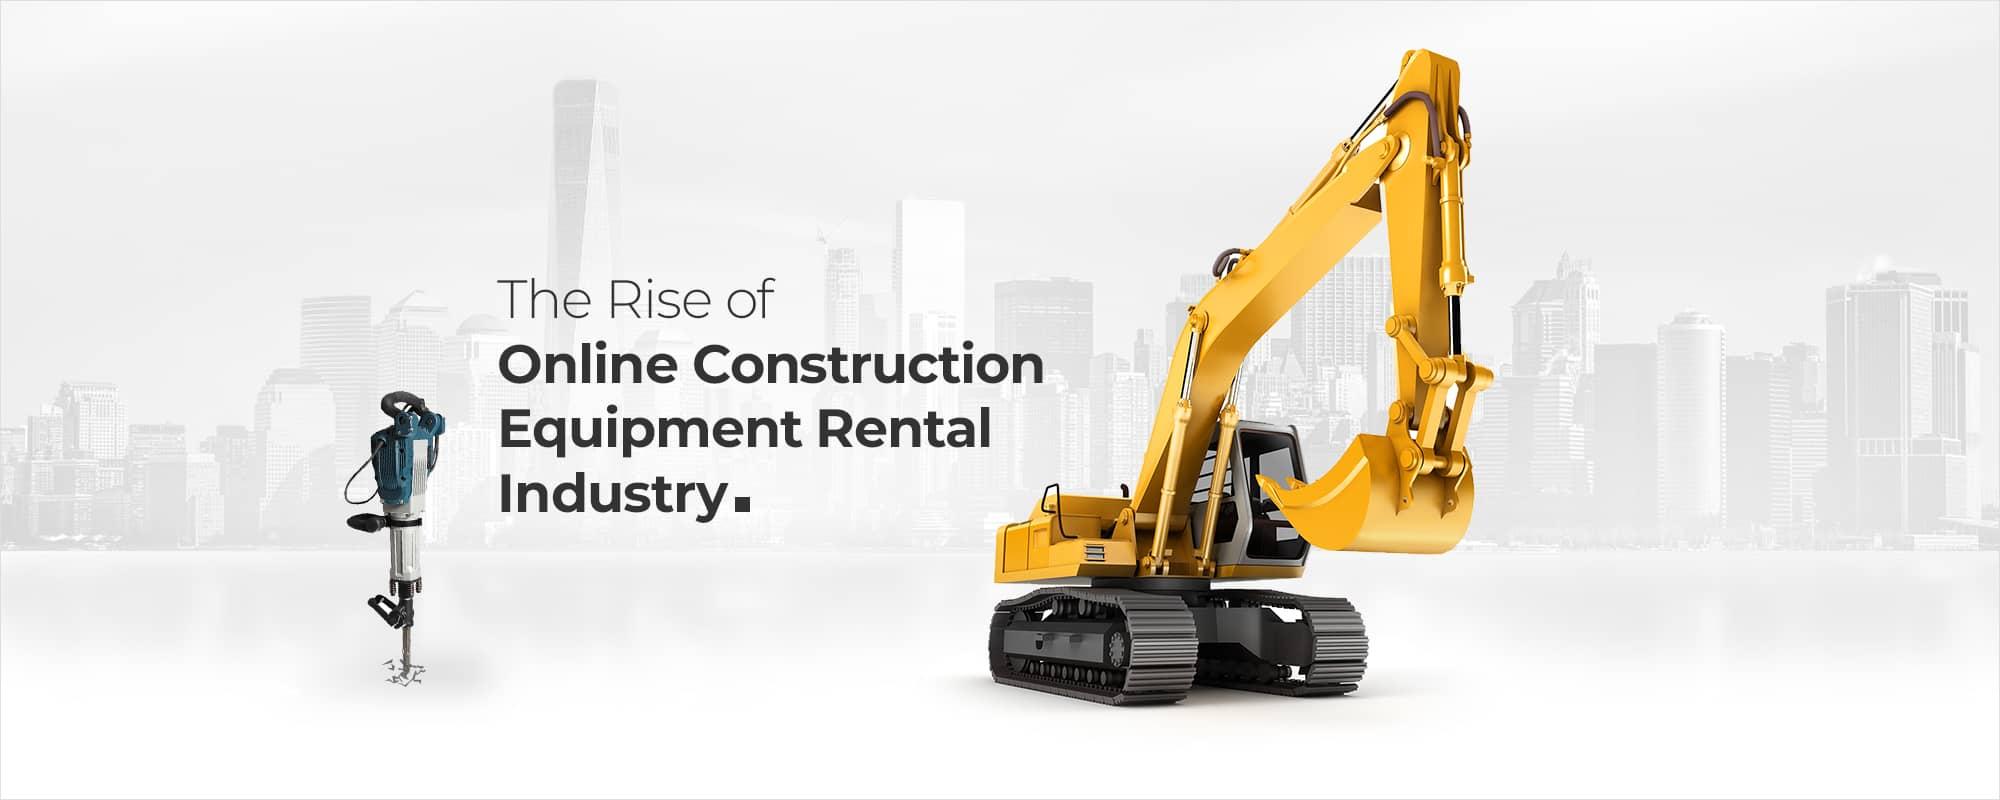 Online Heavy Equipment Rental Marketplace Business Model, Recent Innovations & Key Differentiators